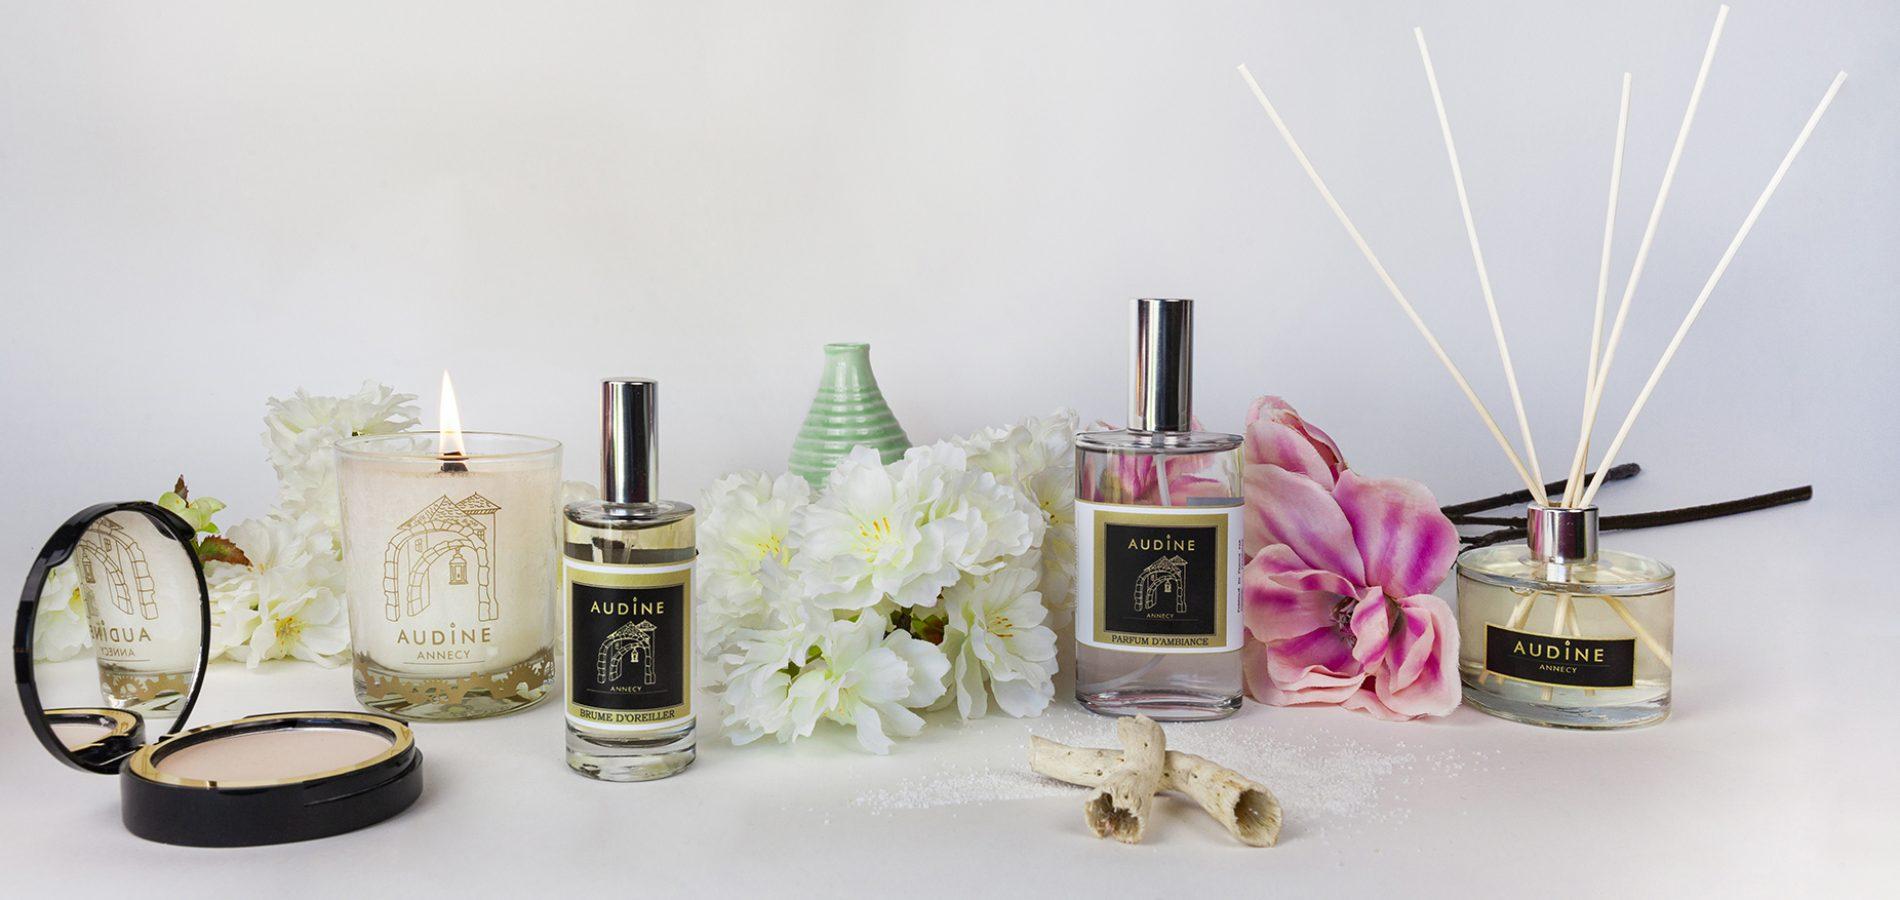 audine bougie annecy parfum ambiance